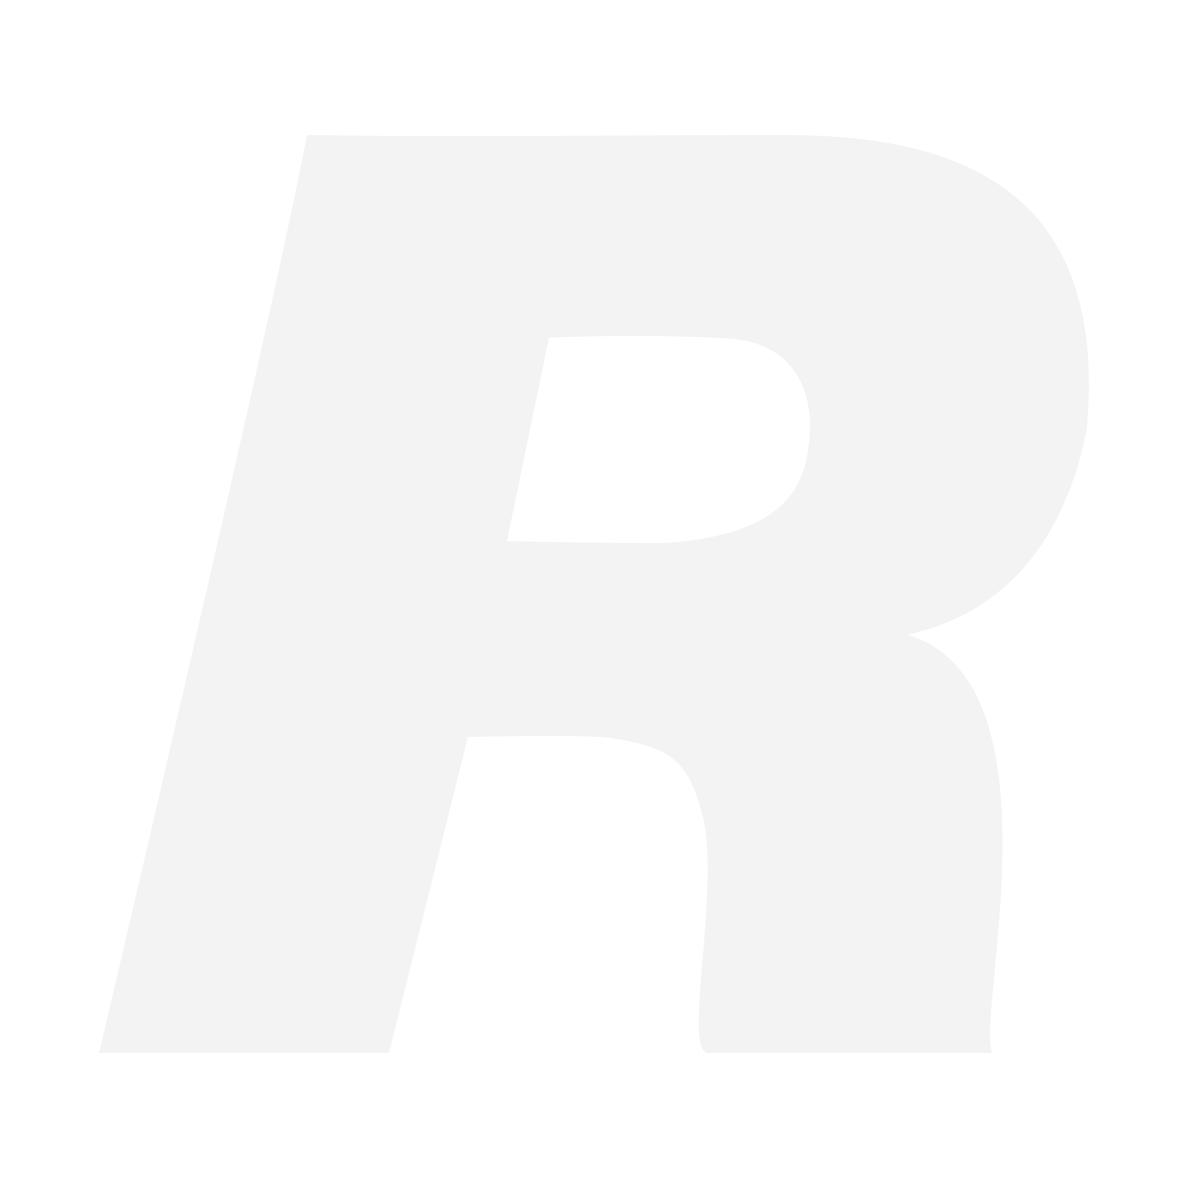 Leica Rangemaster 2700-B CRF